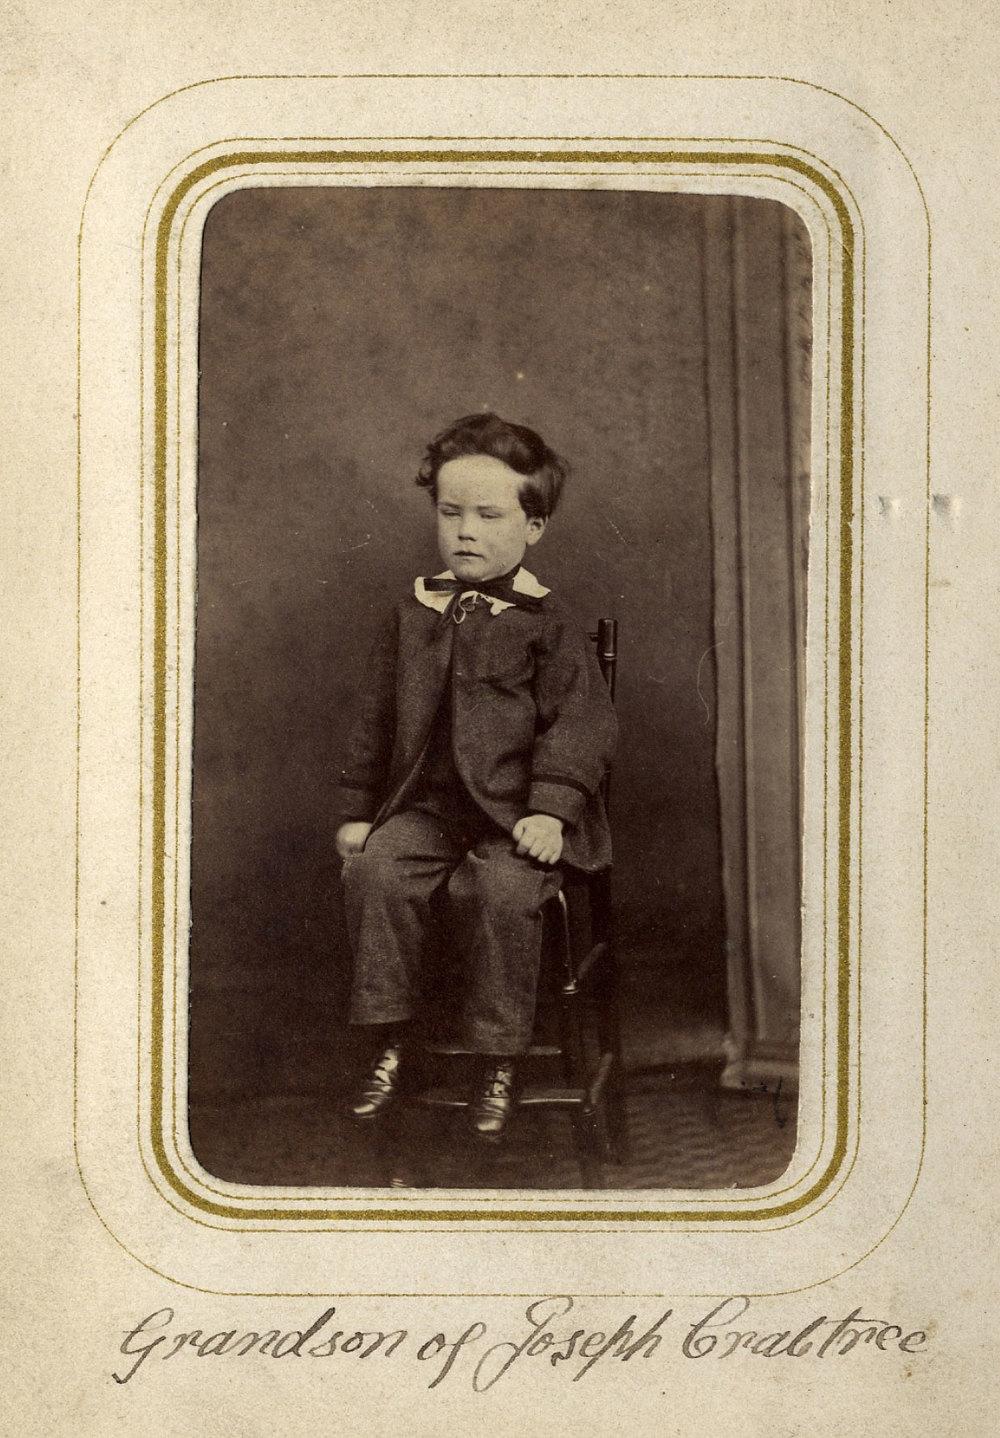 Grandson-of-Joseph-Crabtreeweb.jpg